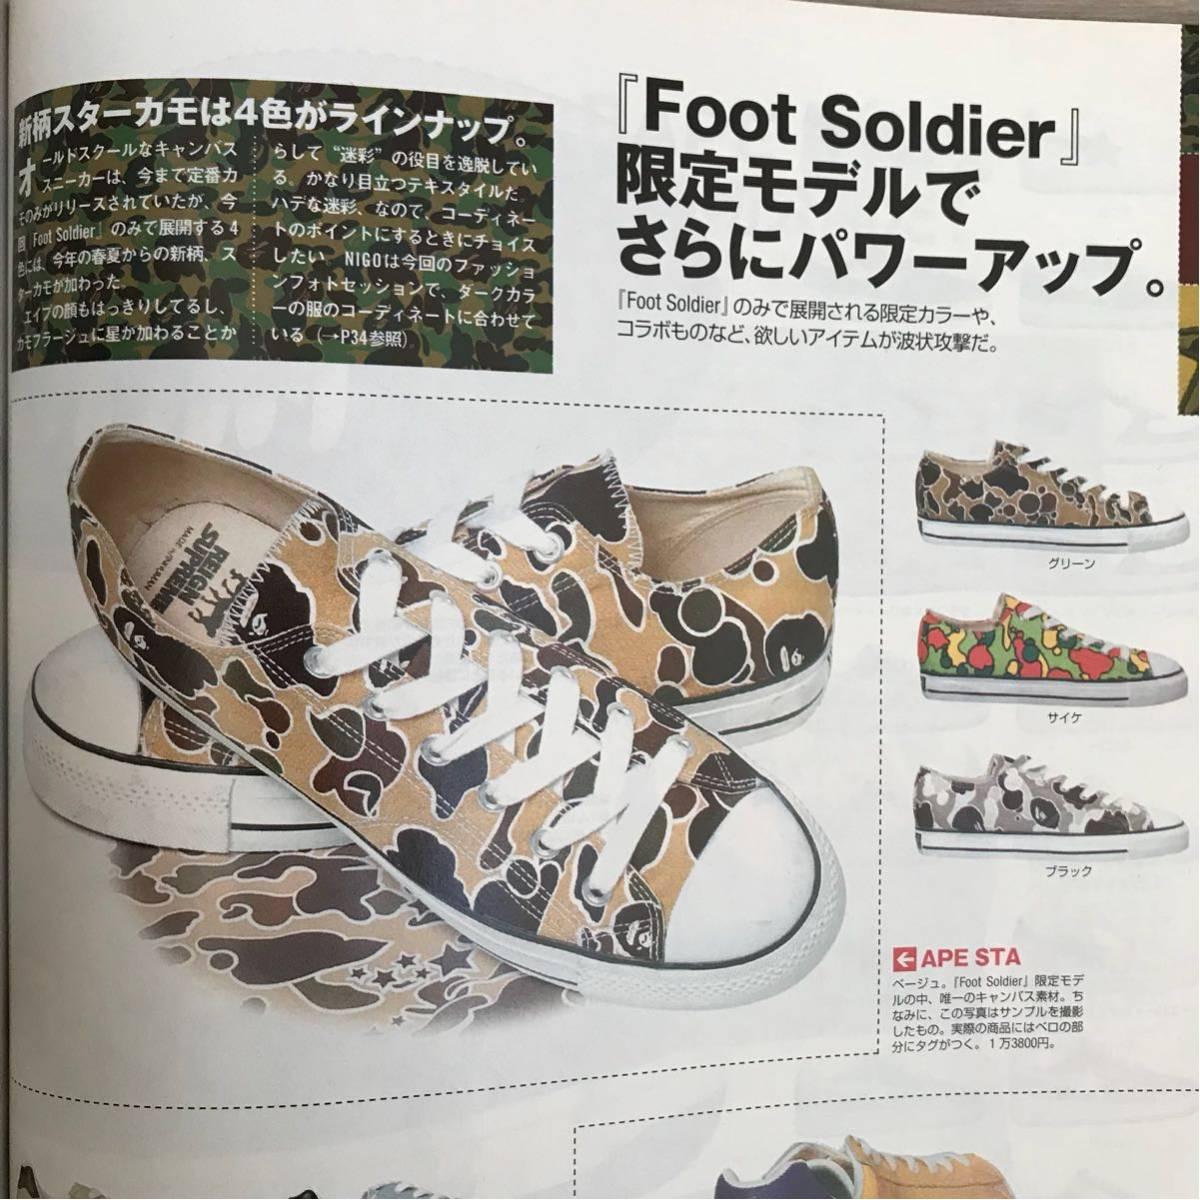 ★Foot Soldier限定★ psyche camo ape sta 28cm bape サイケ フットソルジャー bapesta a bathing ape スニーカー sneakers nigo